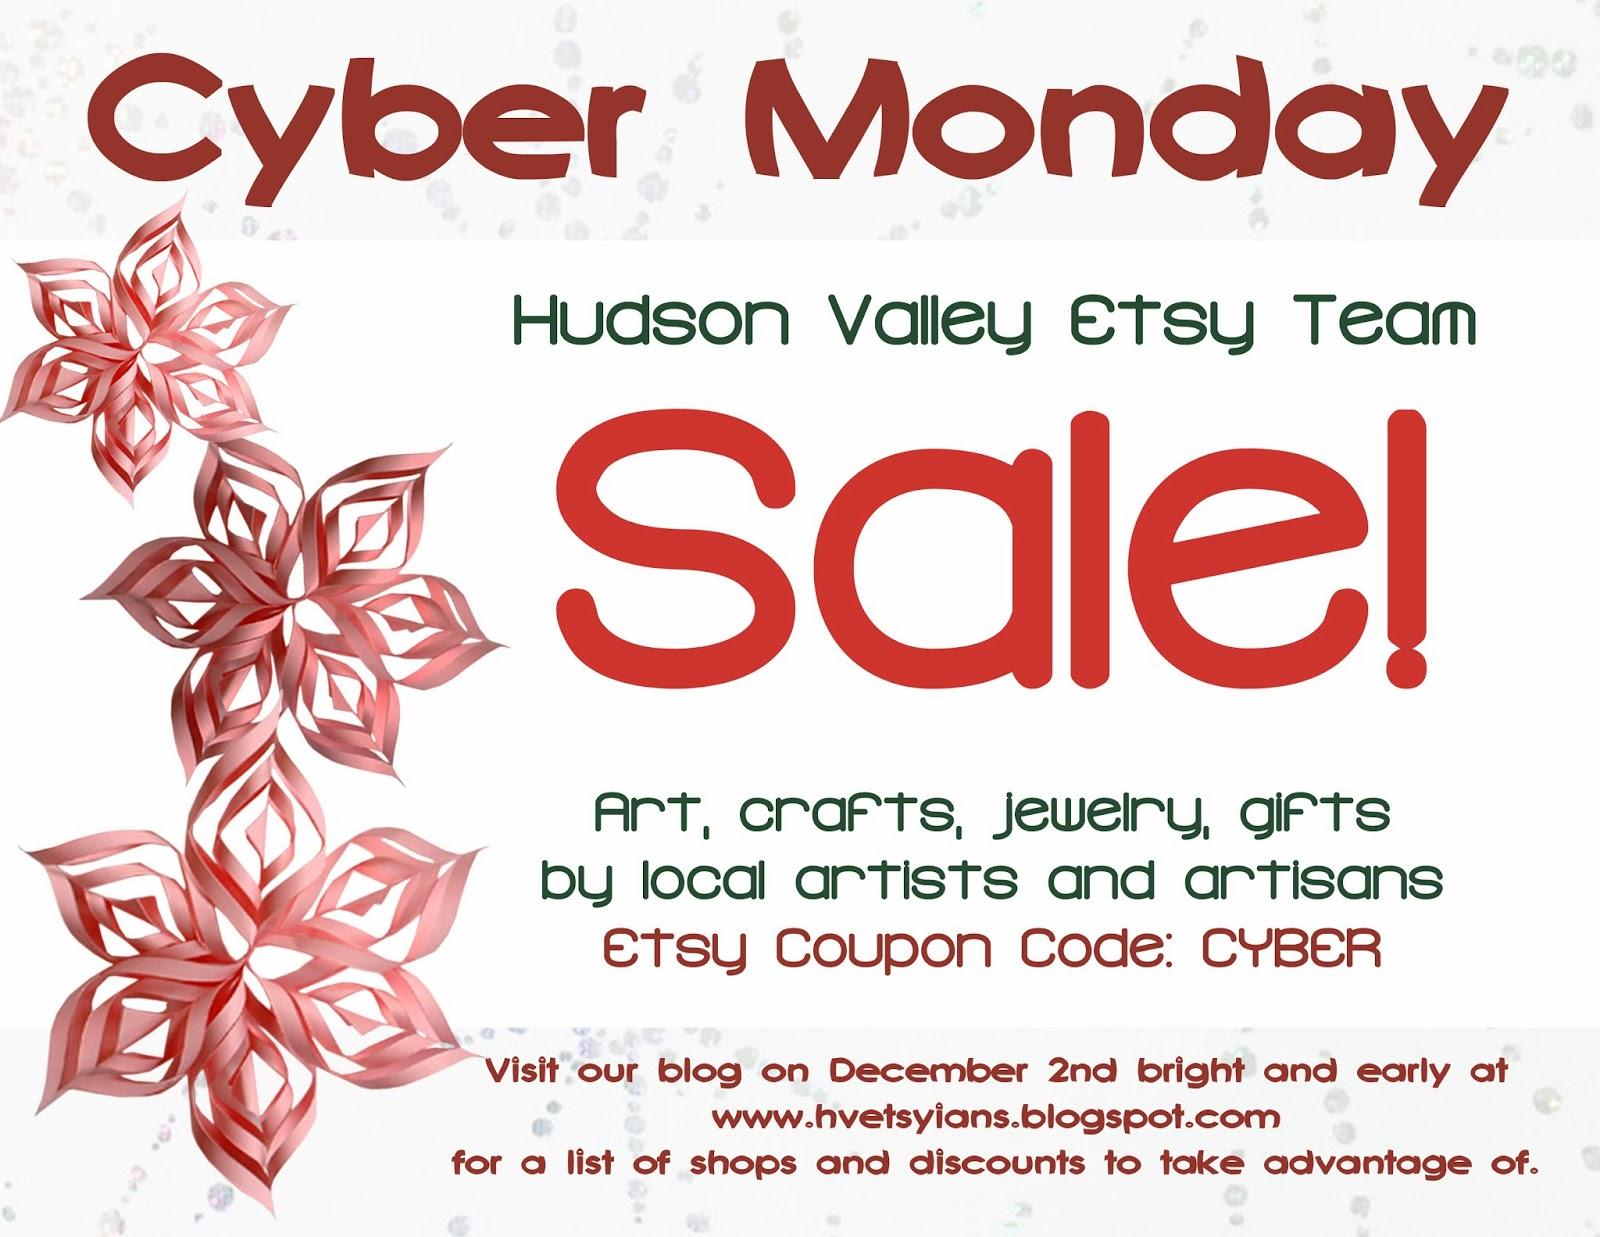 Cyber Monday Hudson Valley Etsy